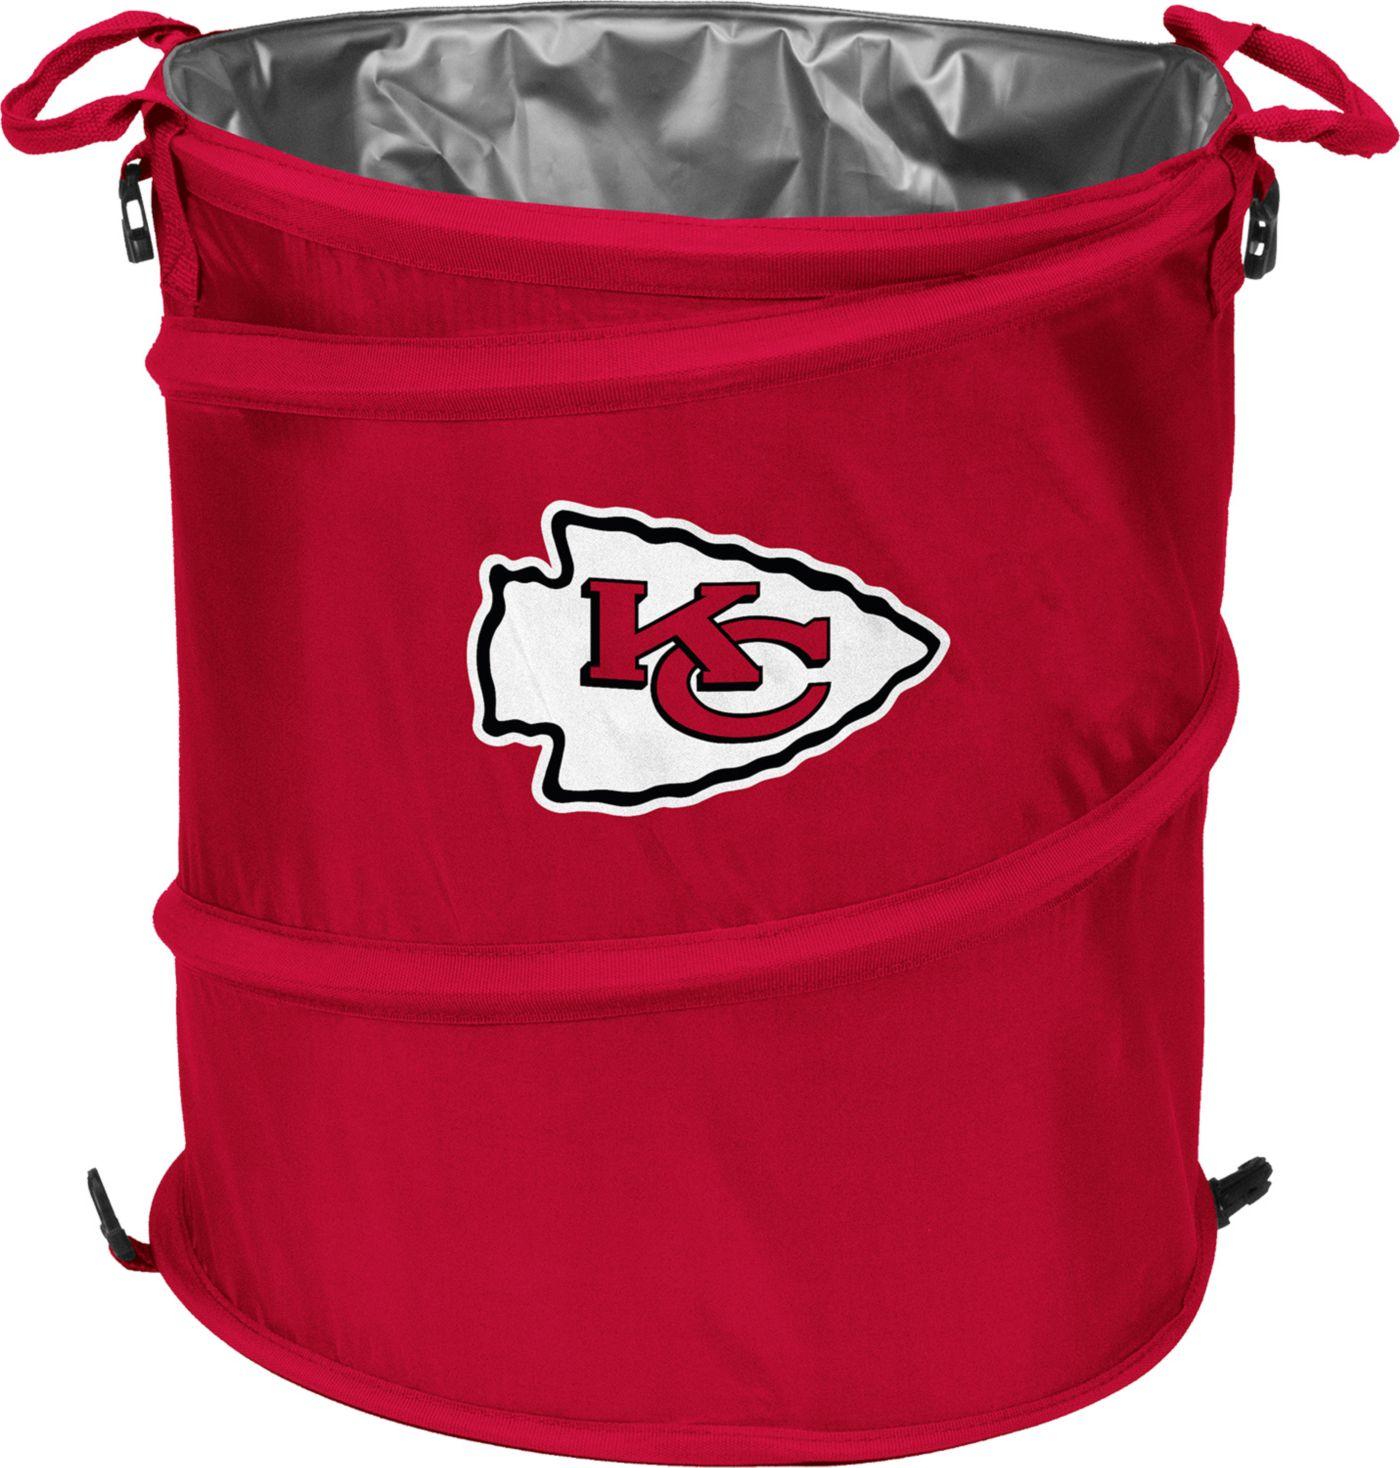 Kansas City Chiefs Trash Can Cooler